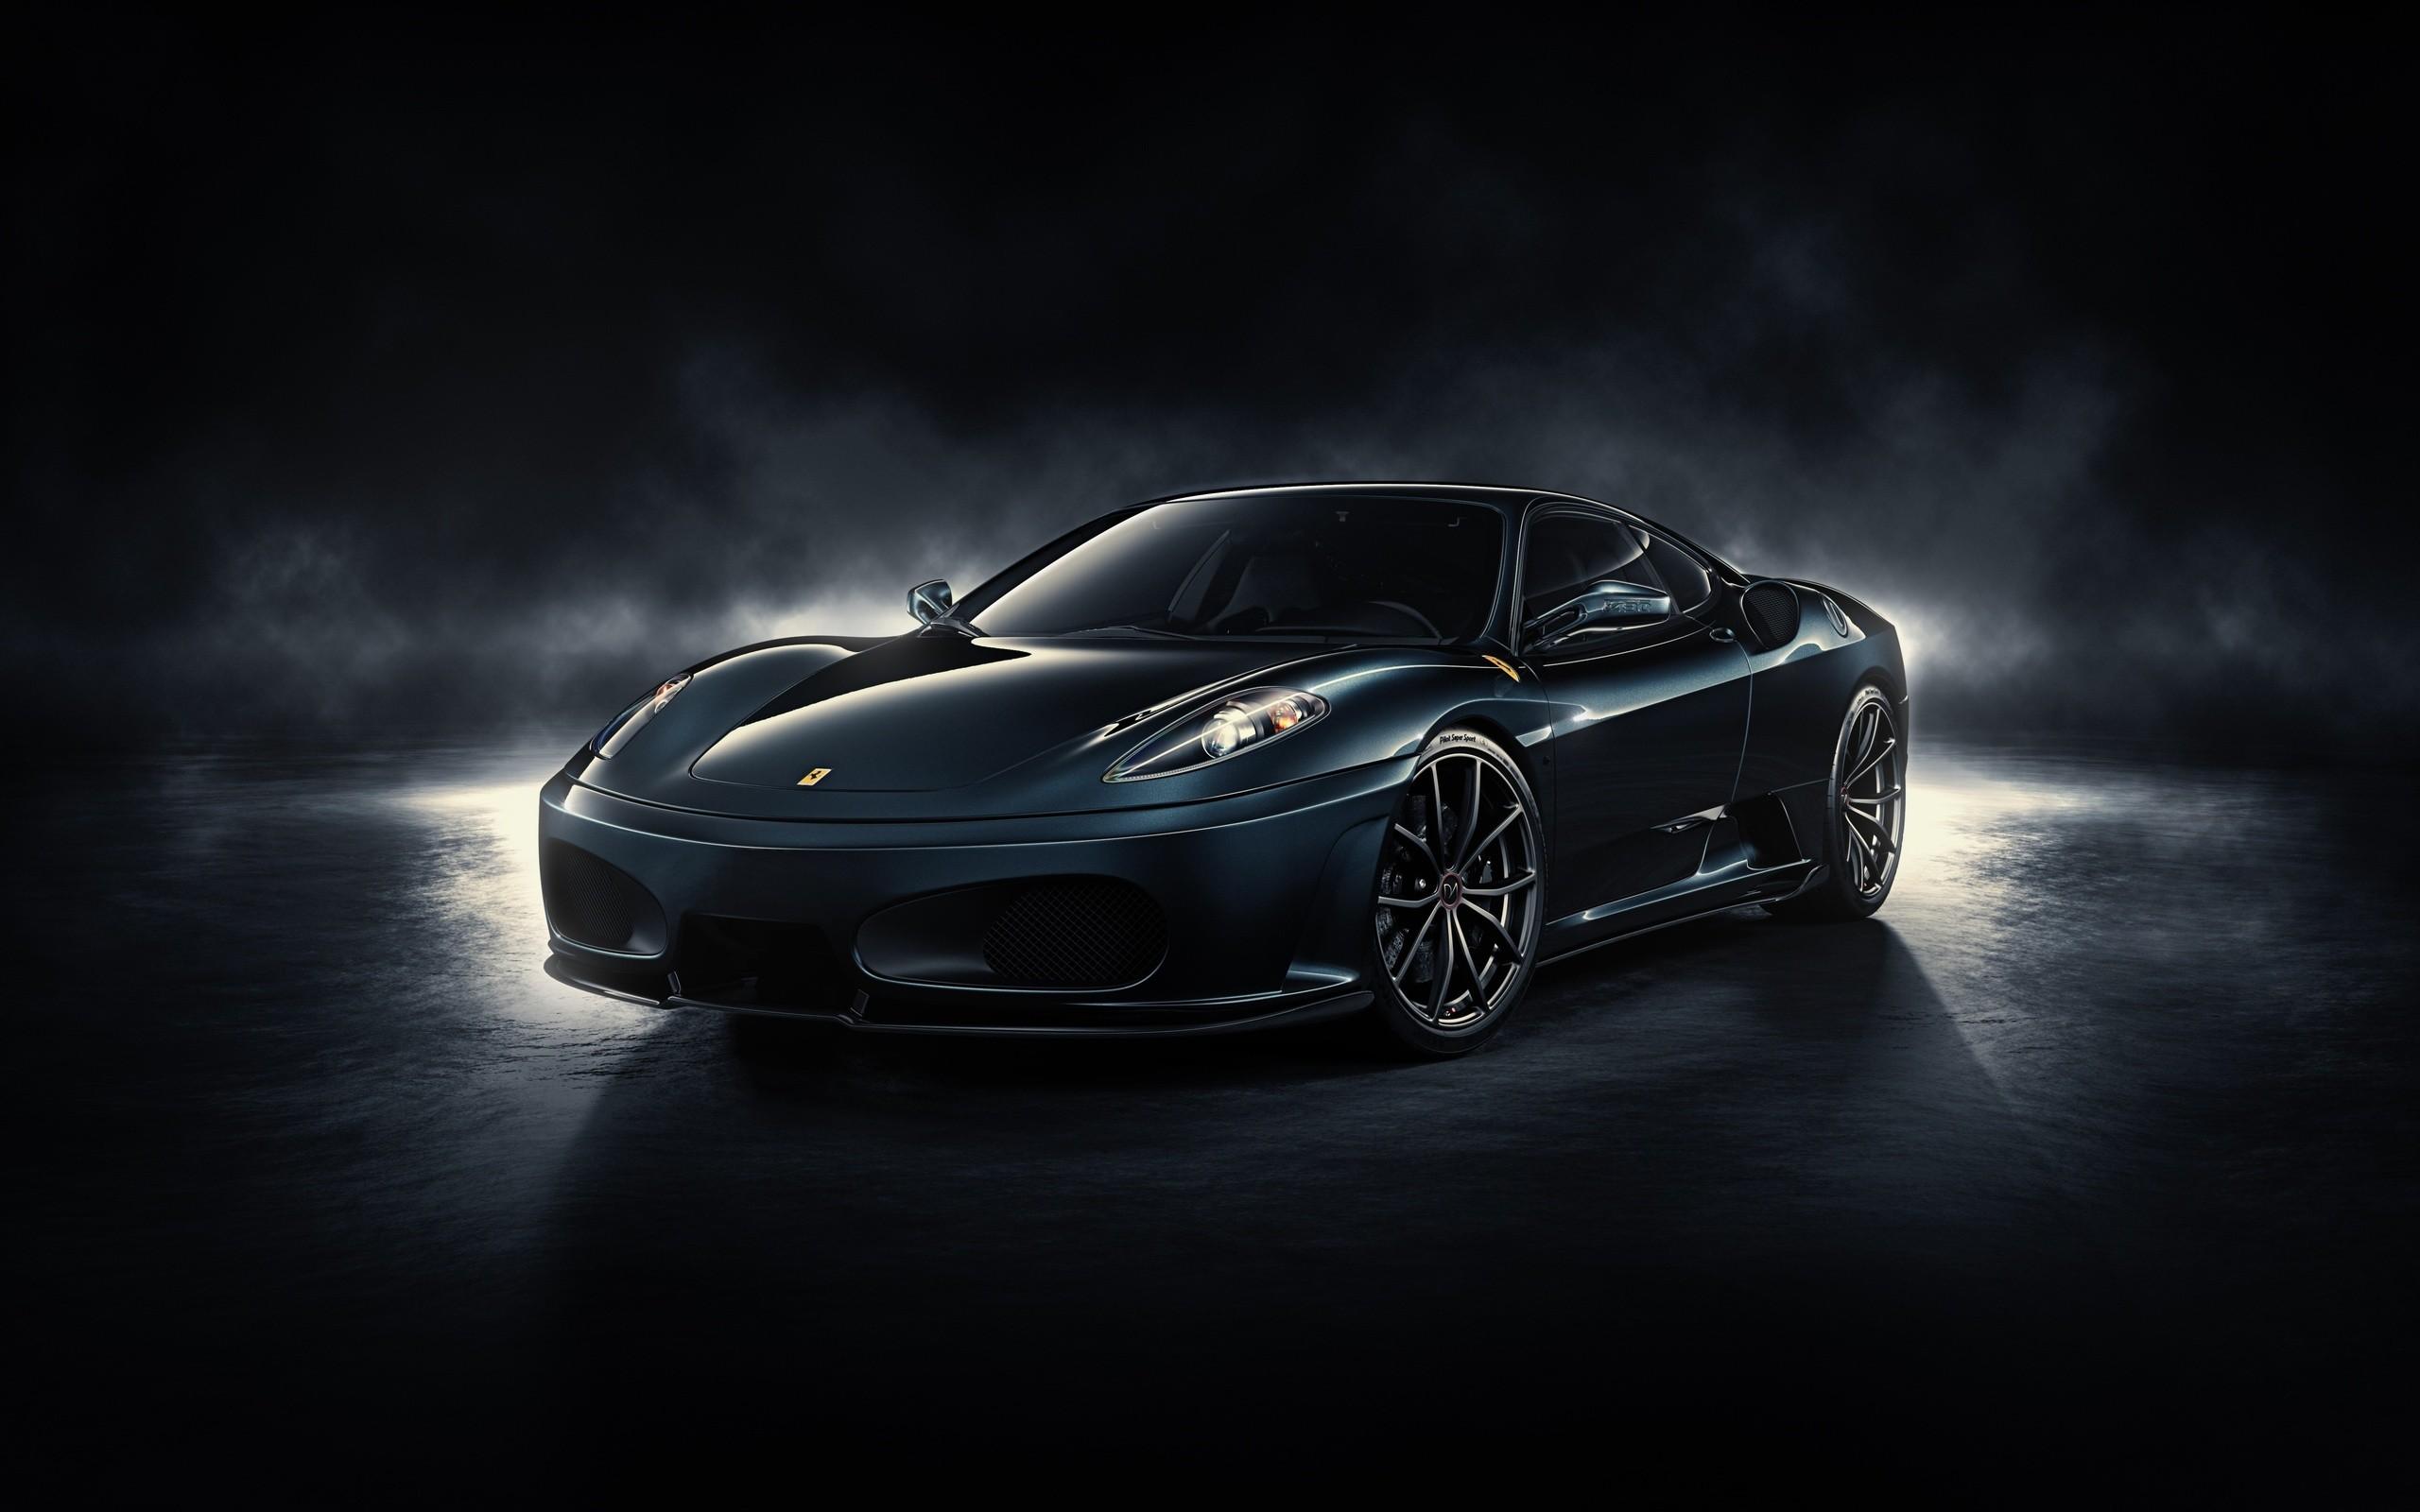 Res: 2560x1600, Download Black Ferrari with Dark Background 4k UHD Car Wallpaper